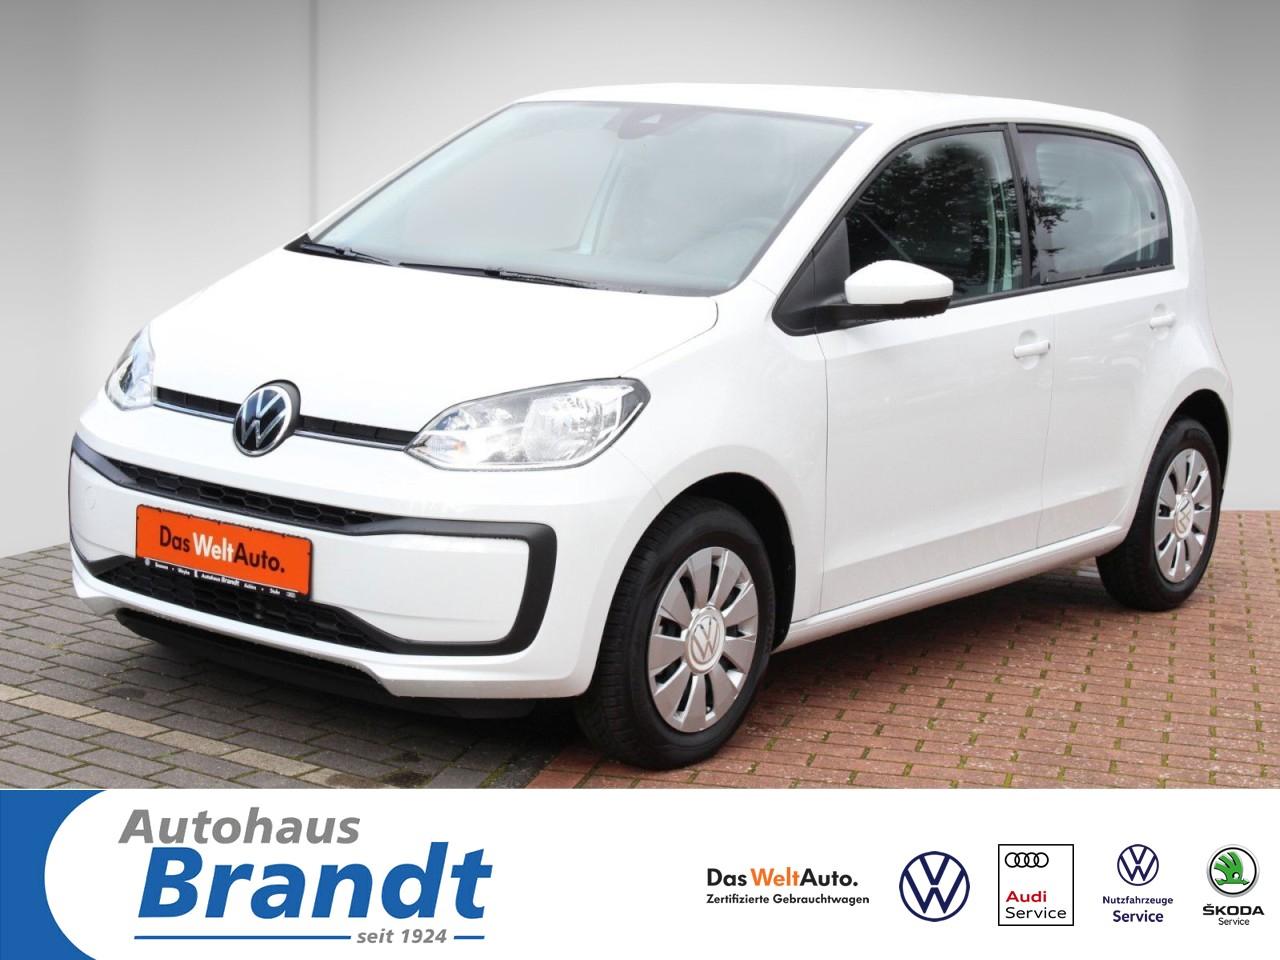 Volkswagen up! 1,0 KLIMA*ZV*TFL LED Klima Fenster el., Jahr 2020, Benzin